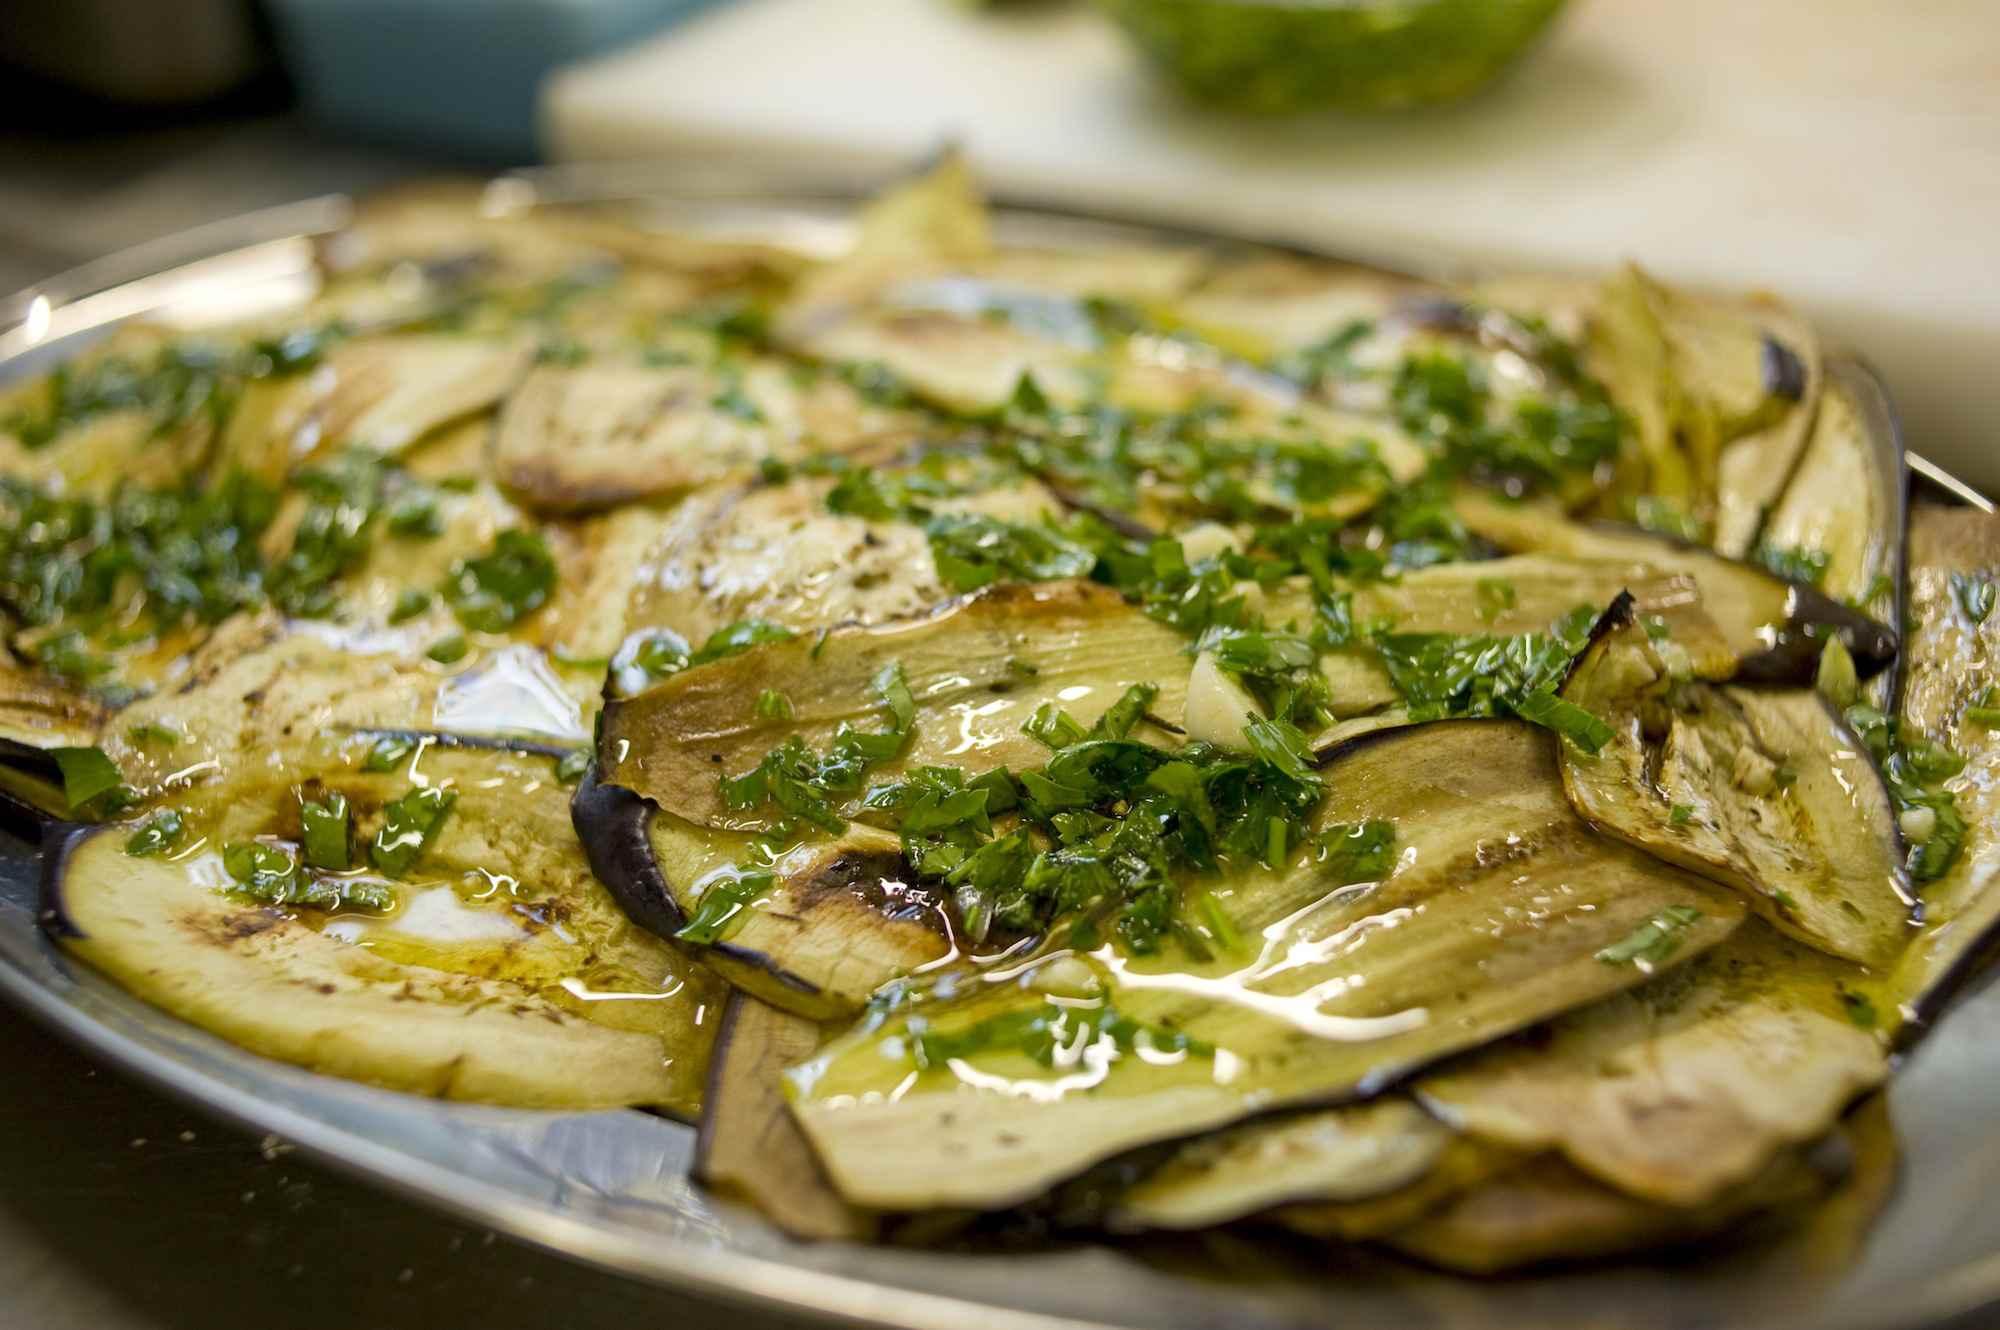 Grilled aubergine, Italian starter, antipasti